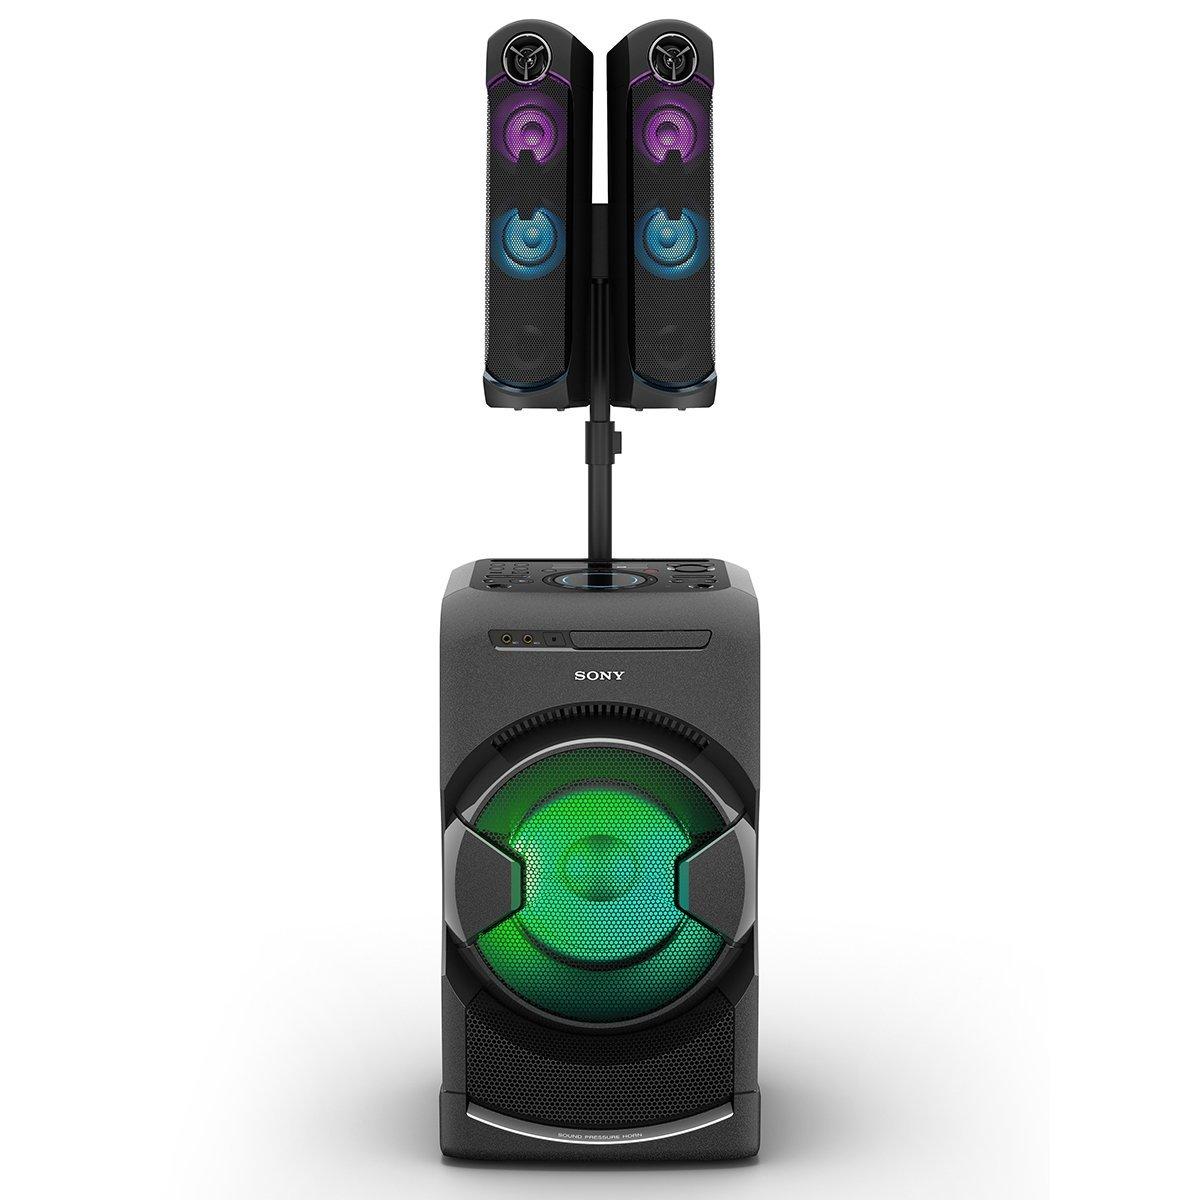 Sistem audio Sony MHC-GT4D NFC Negru